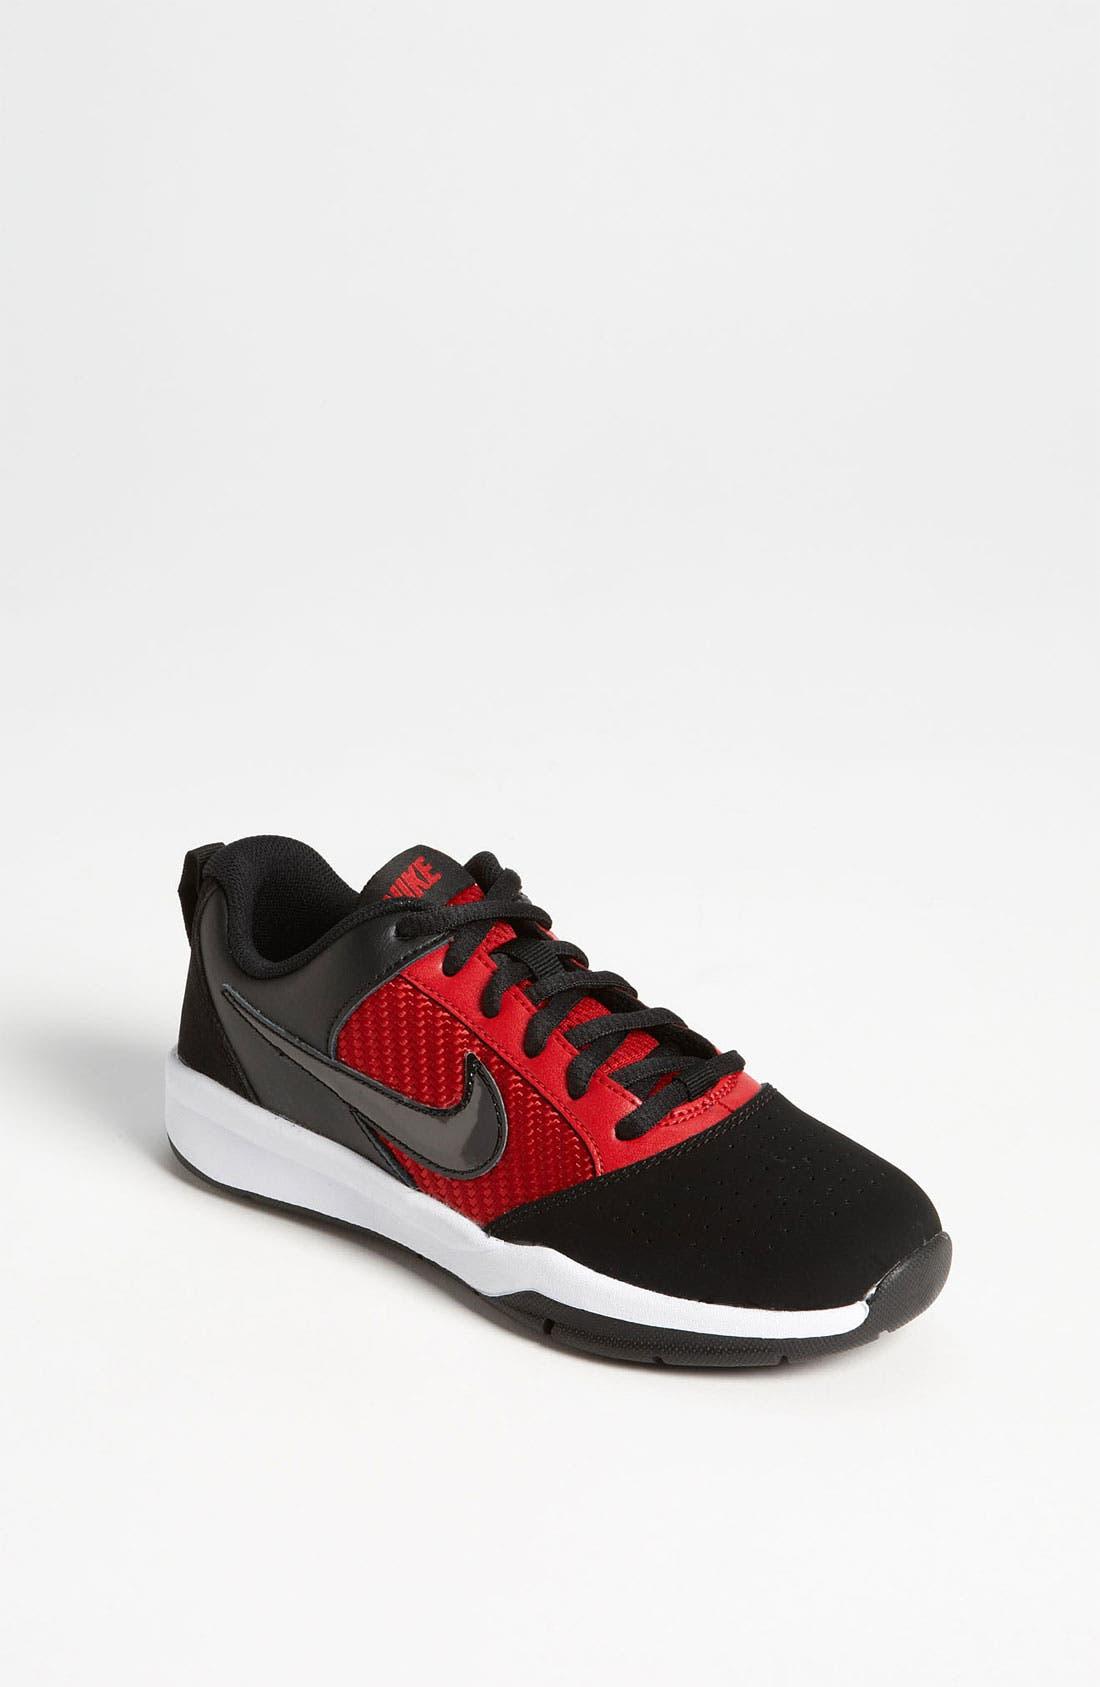 Main Image - Nike 'Quick Baller Low' Sneaker (Toddler & Little Kid)